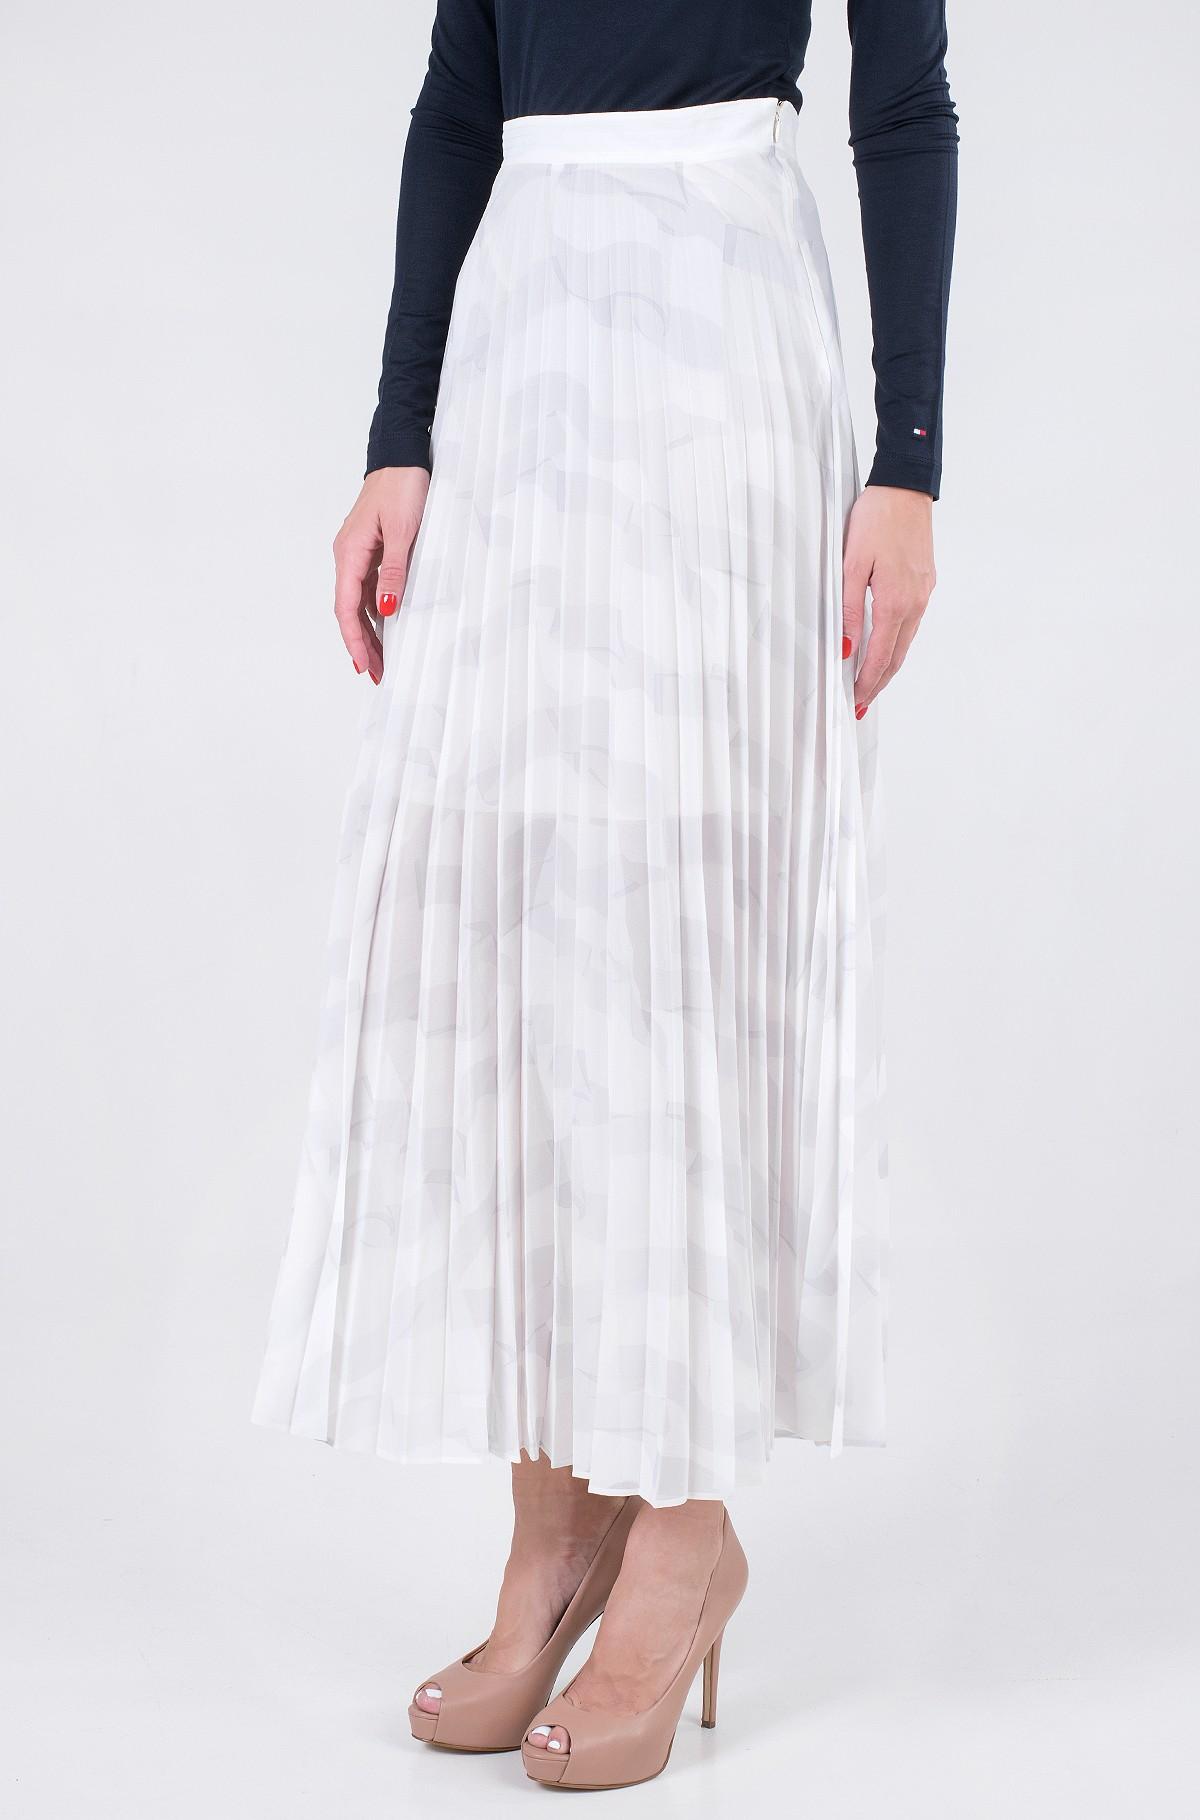 Skirt ICON CHIFFON PLEATED LONG SKIRT-full-1